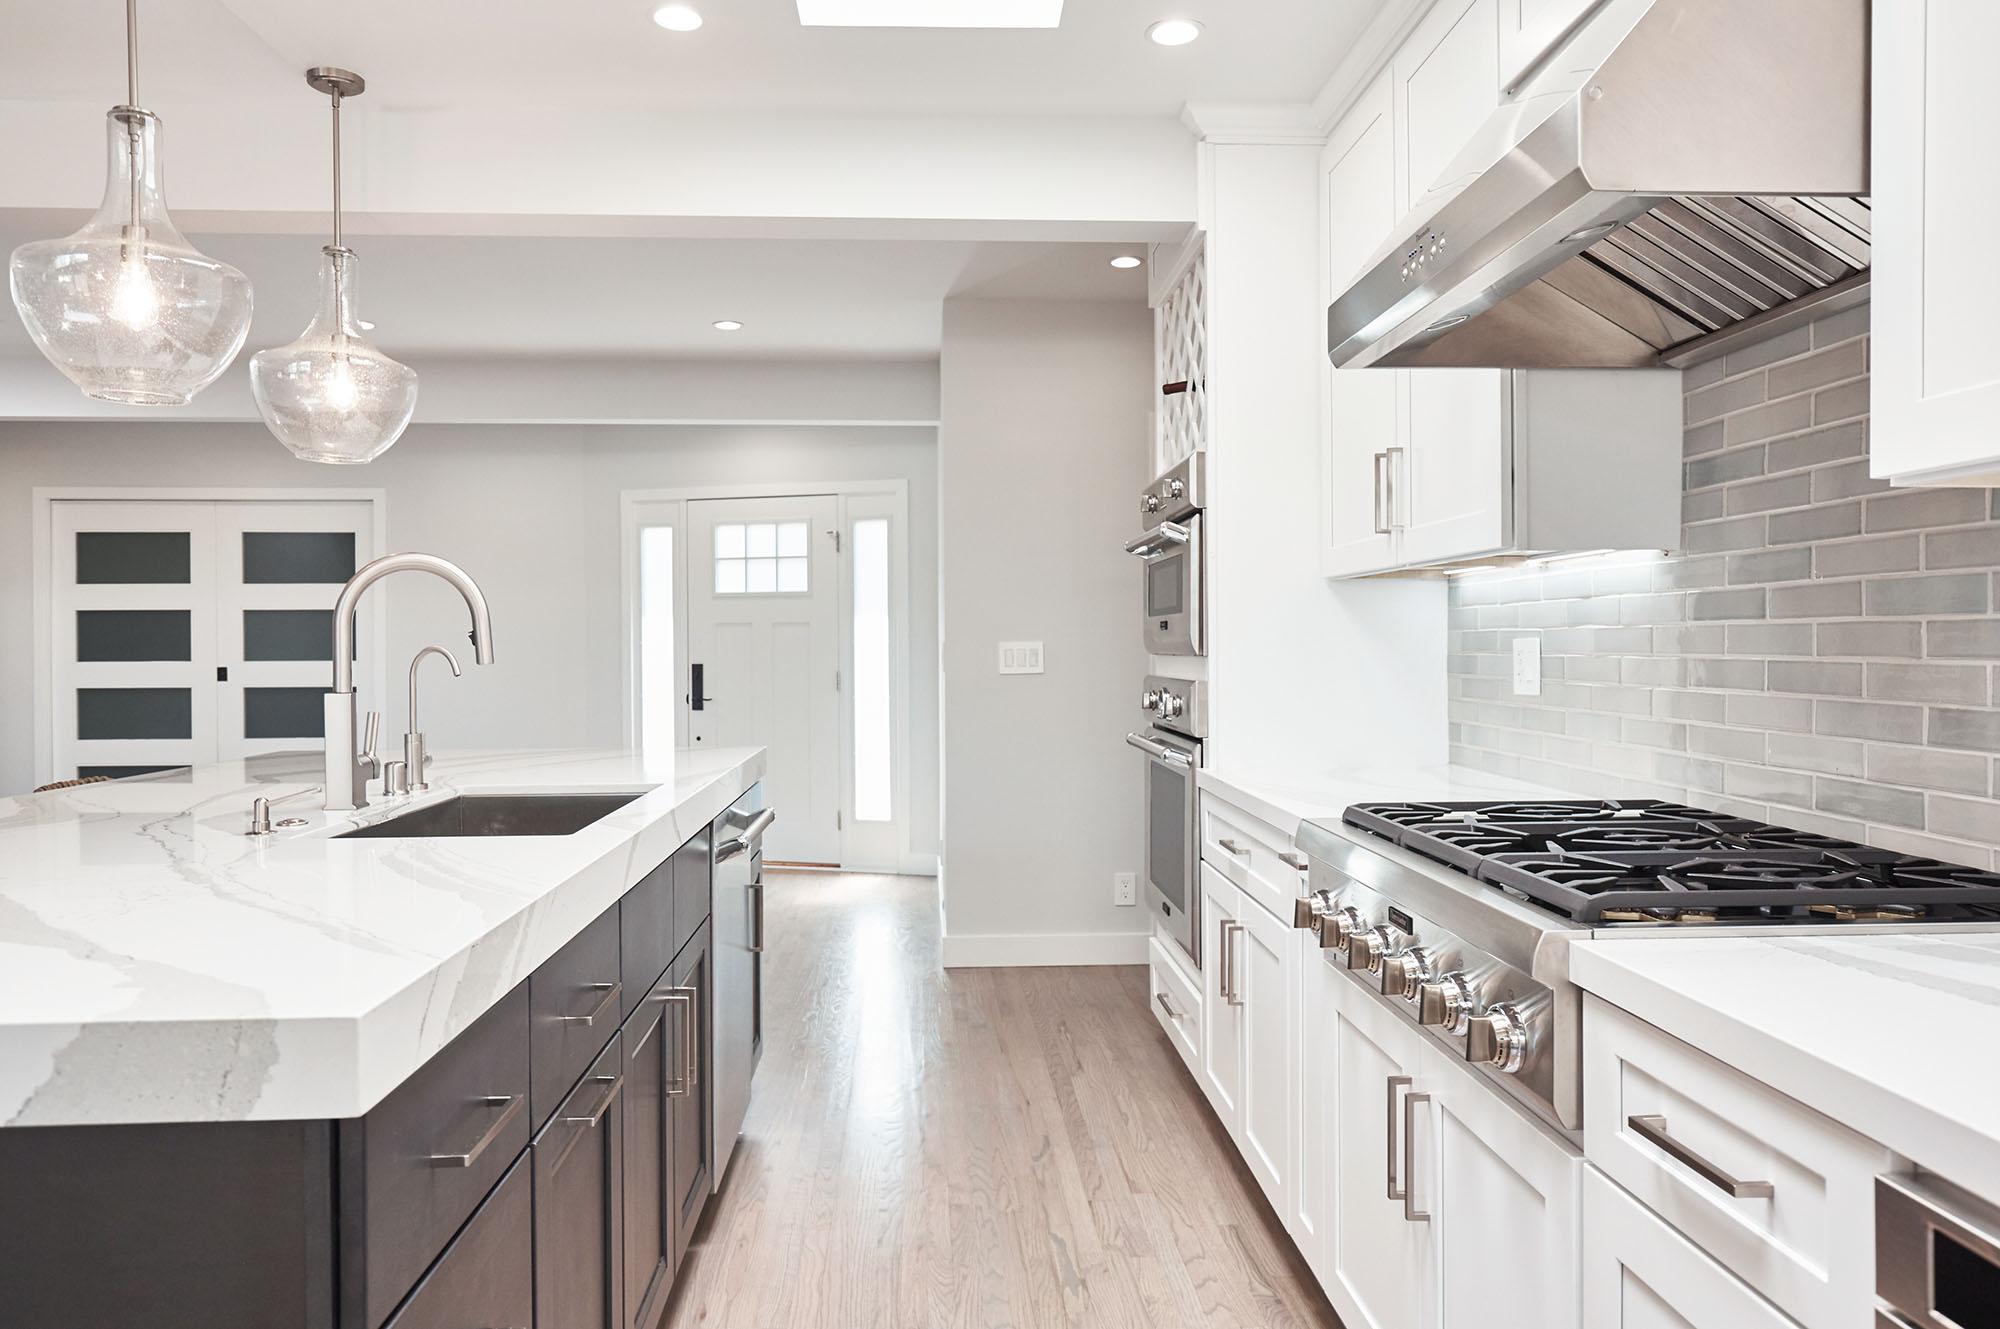 Studio City kitchen remodel 7 SMALL.jpg